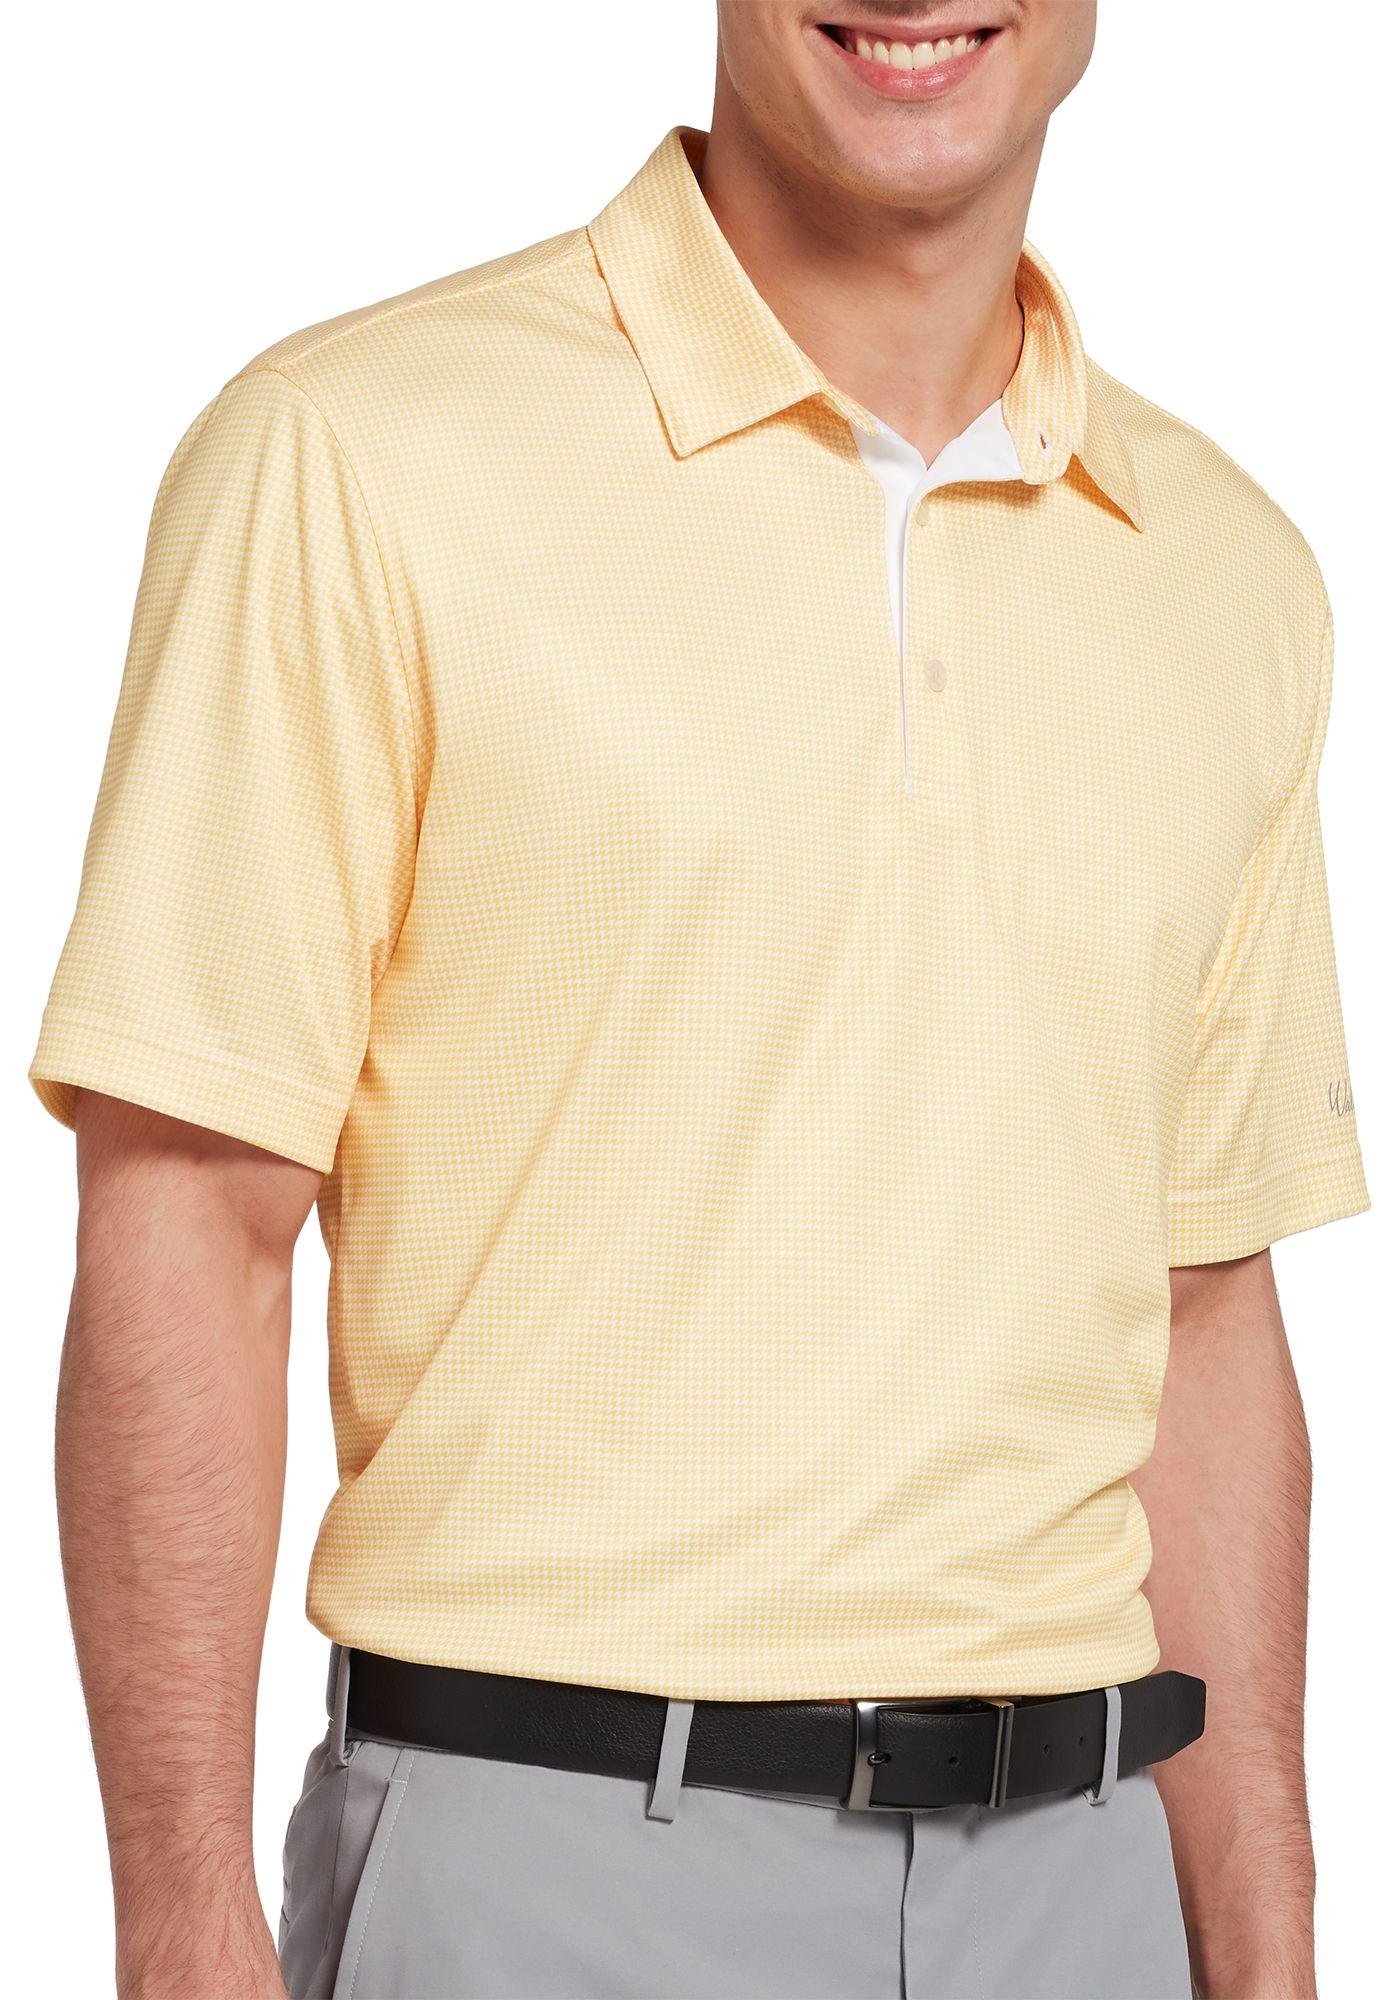 Walter Hagen Men's Essentials Houndstooth Printed Golf Polo